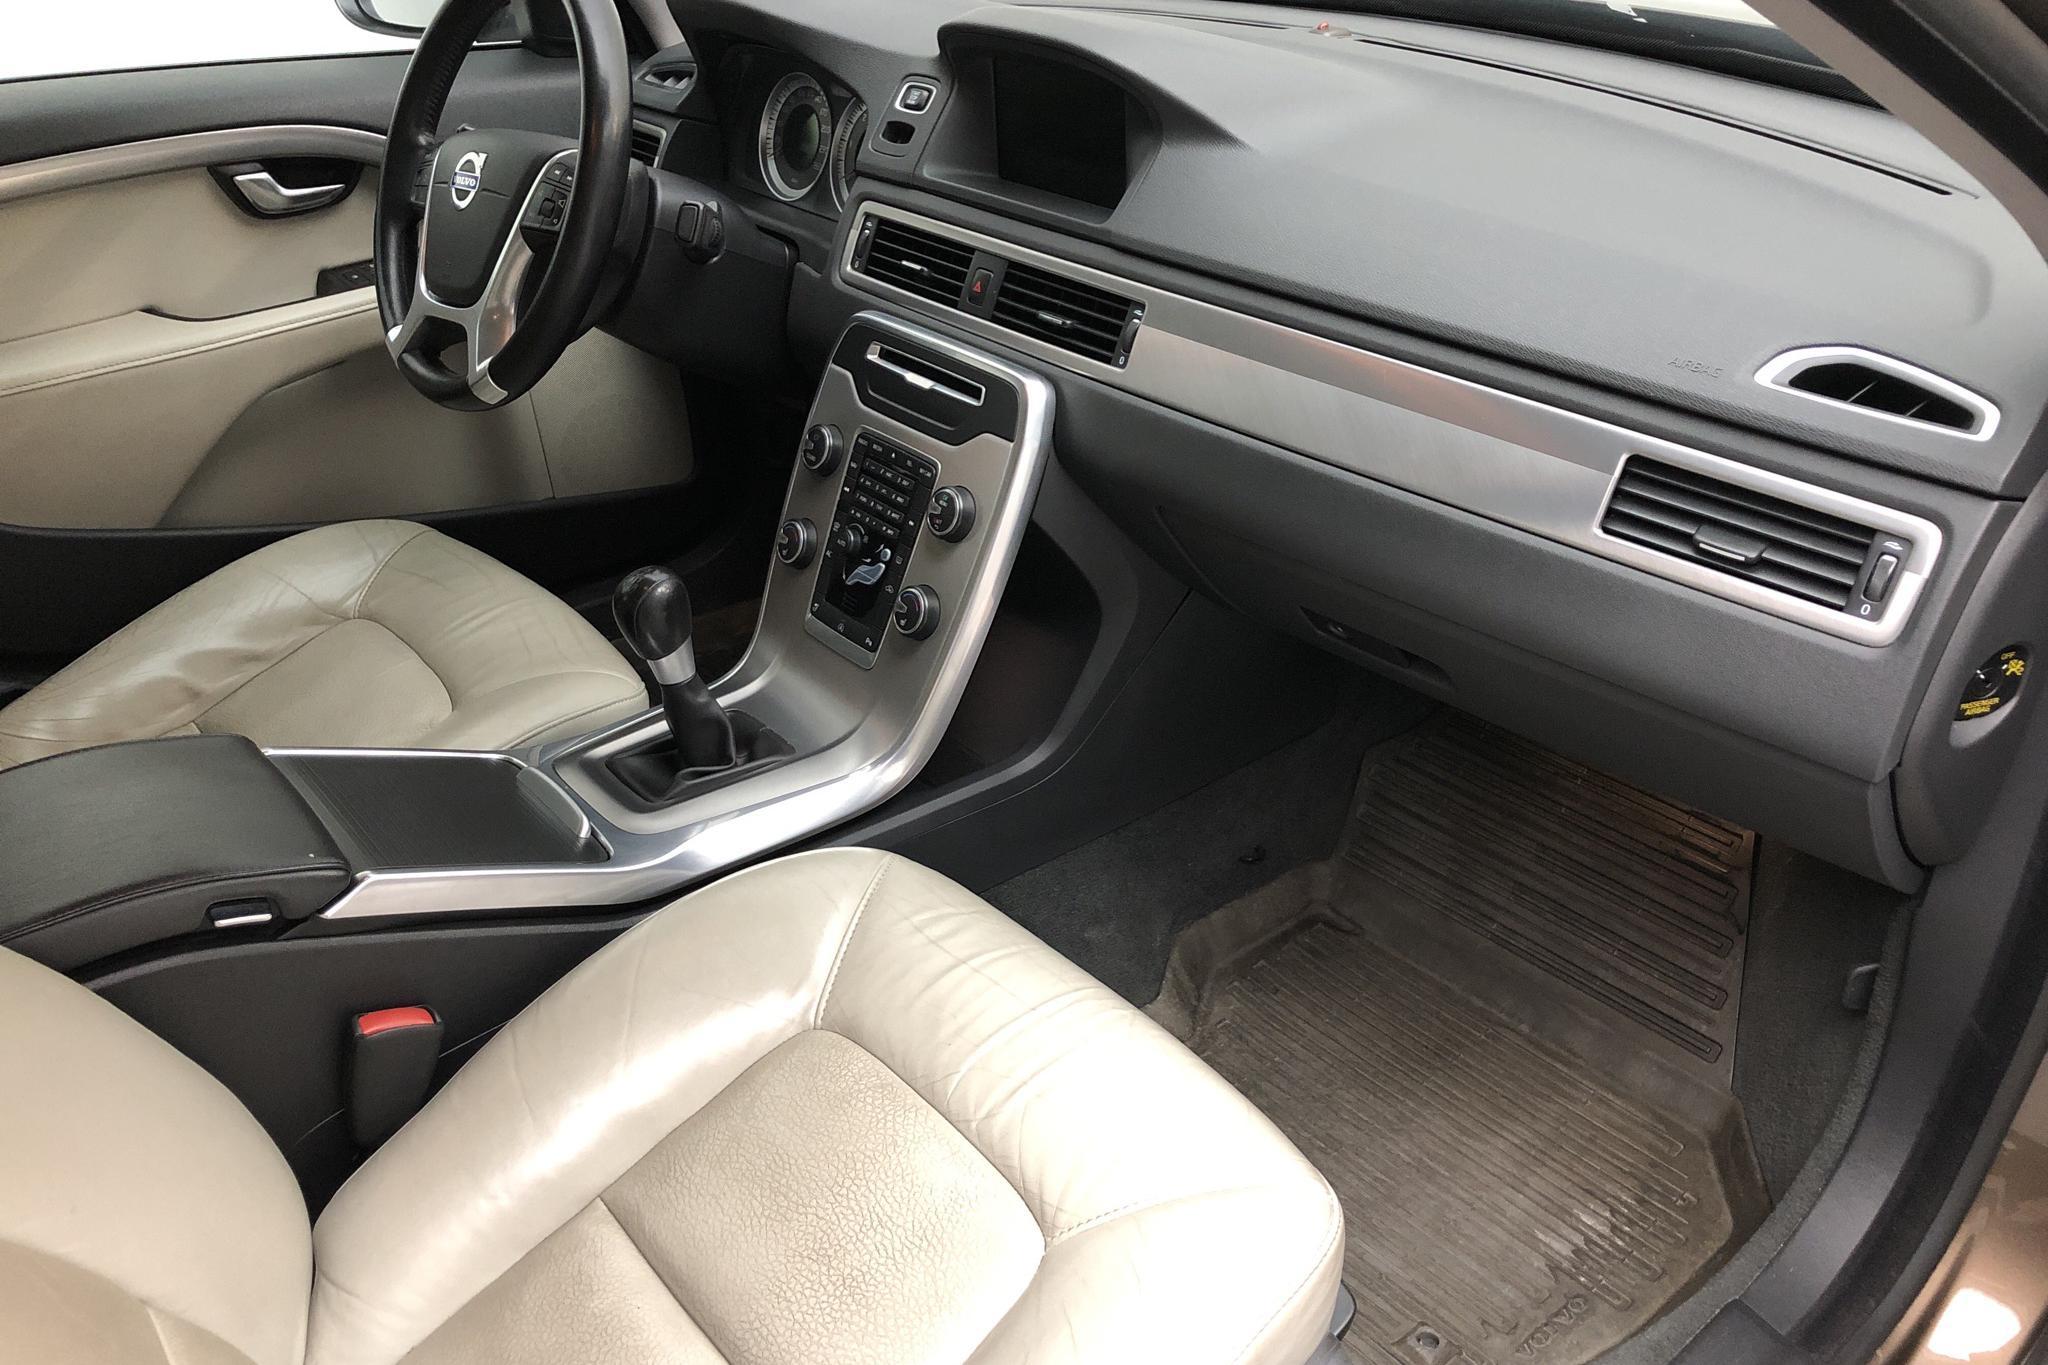 Volvo S80 D4 (163hk) - 196 810 km - Manual - brown - 2013